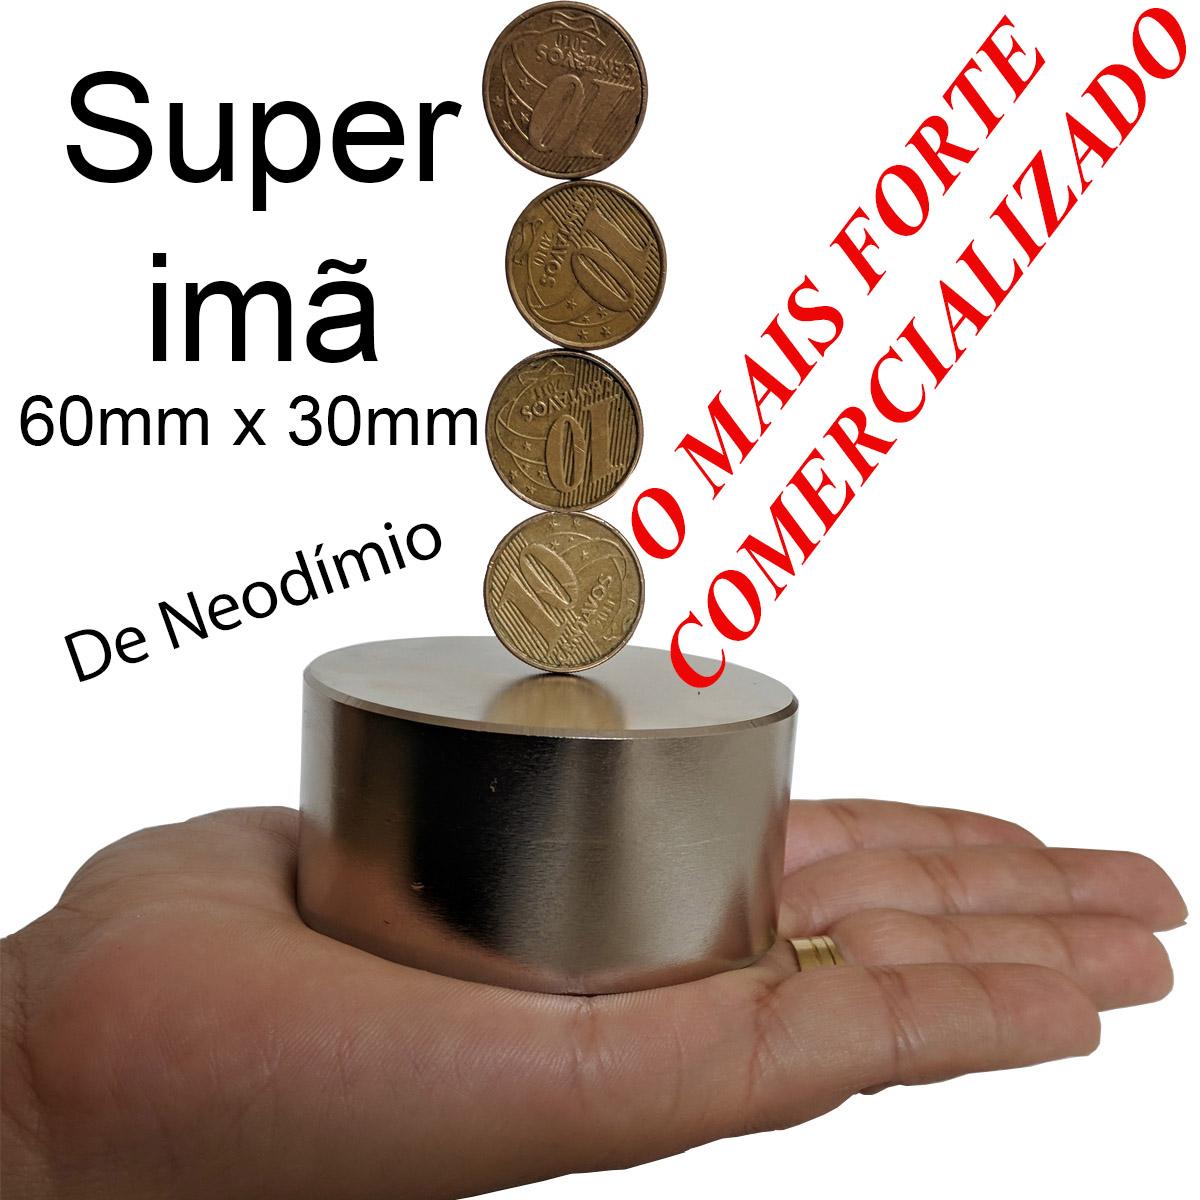 Ima De Neodimio 60mm X 30mm O Maior Imã Super Forte